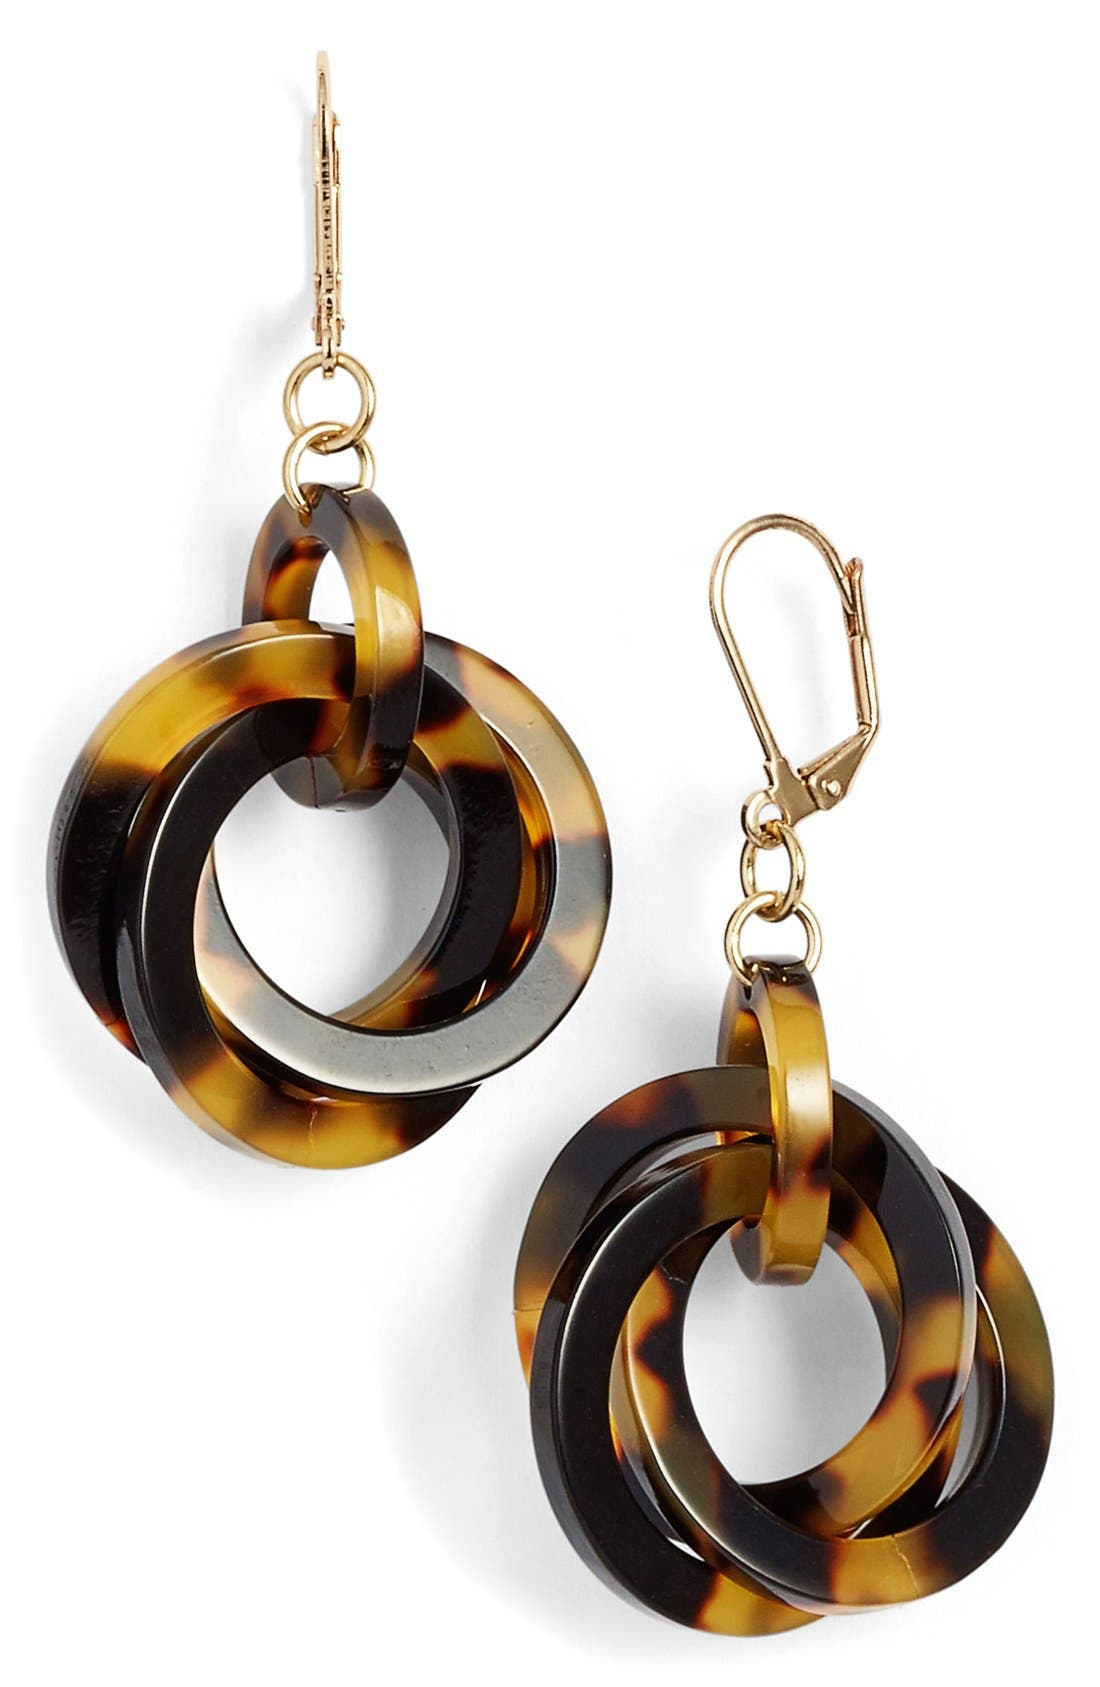 L. Erickson 'Twisted Loops' Drop Earrings